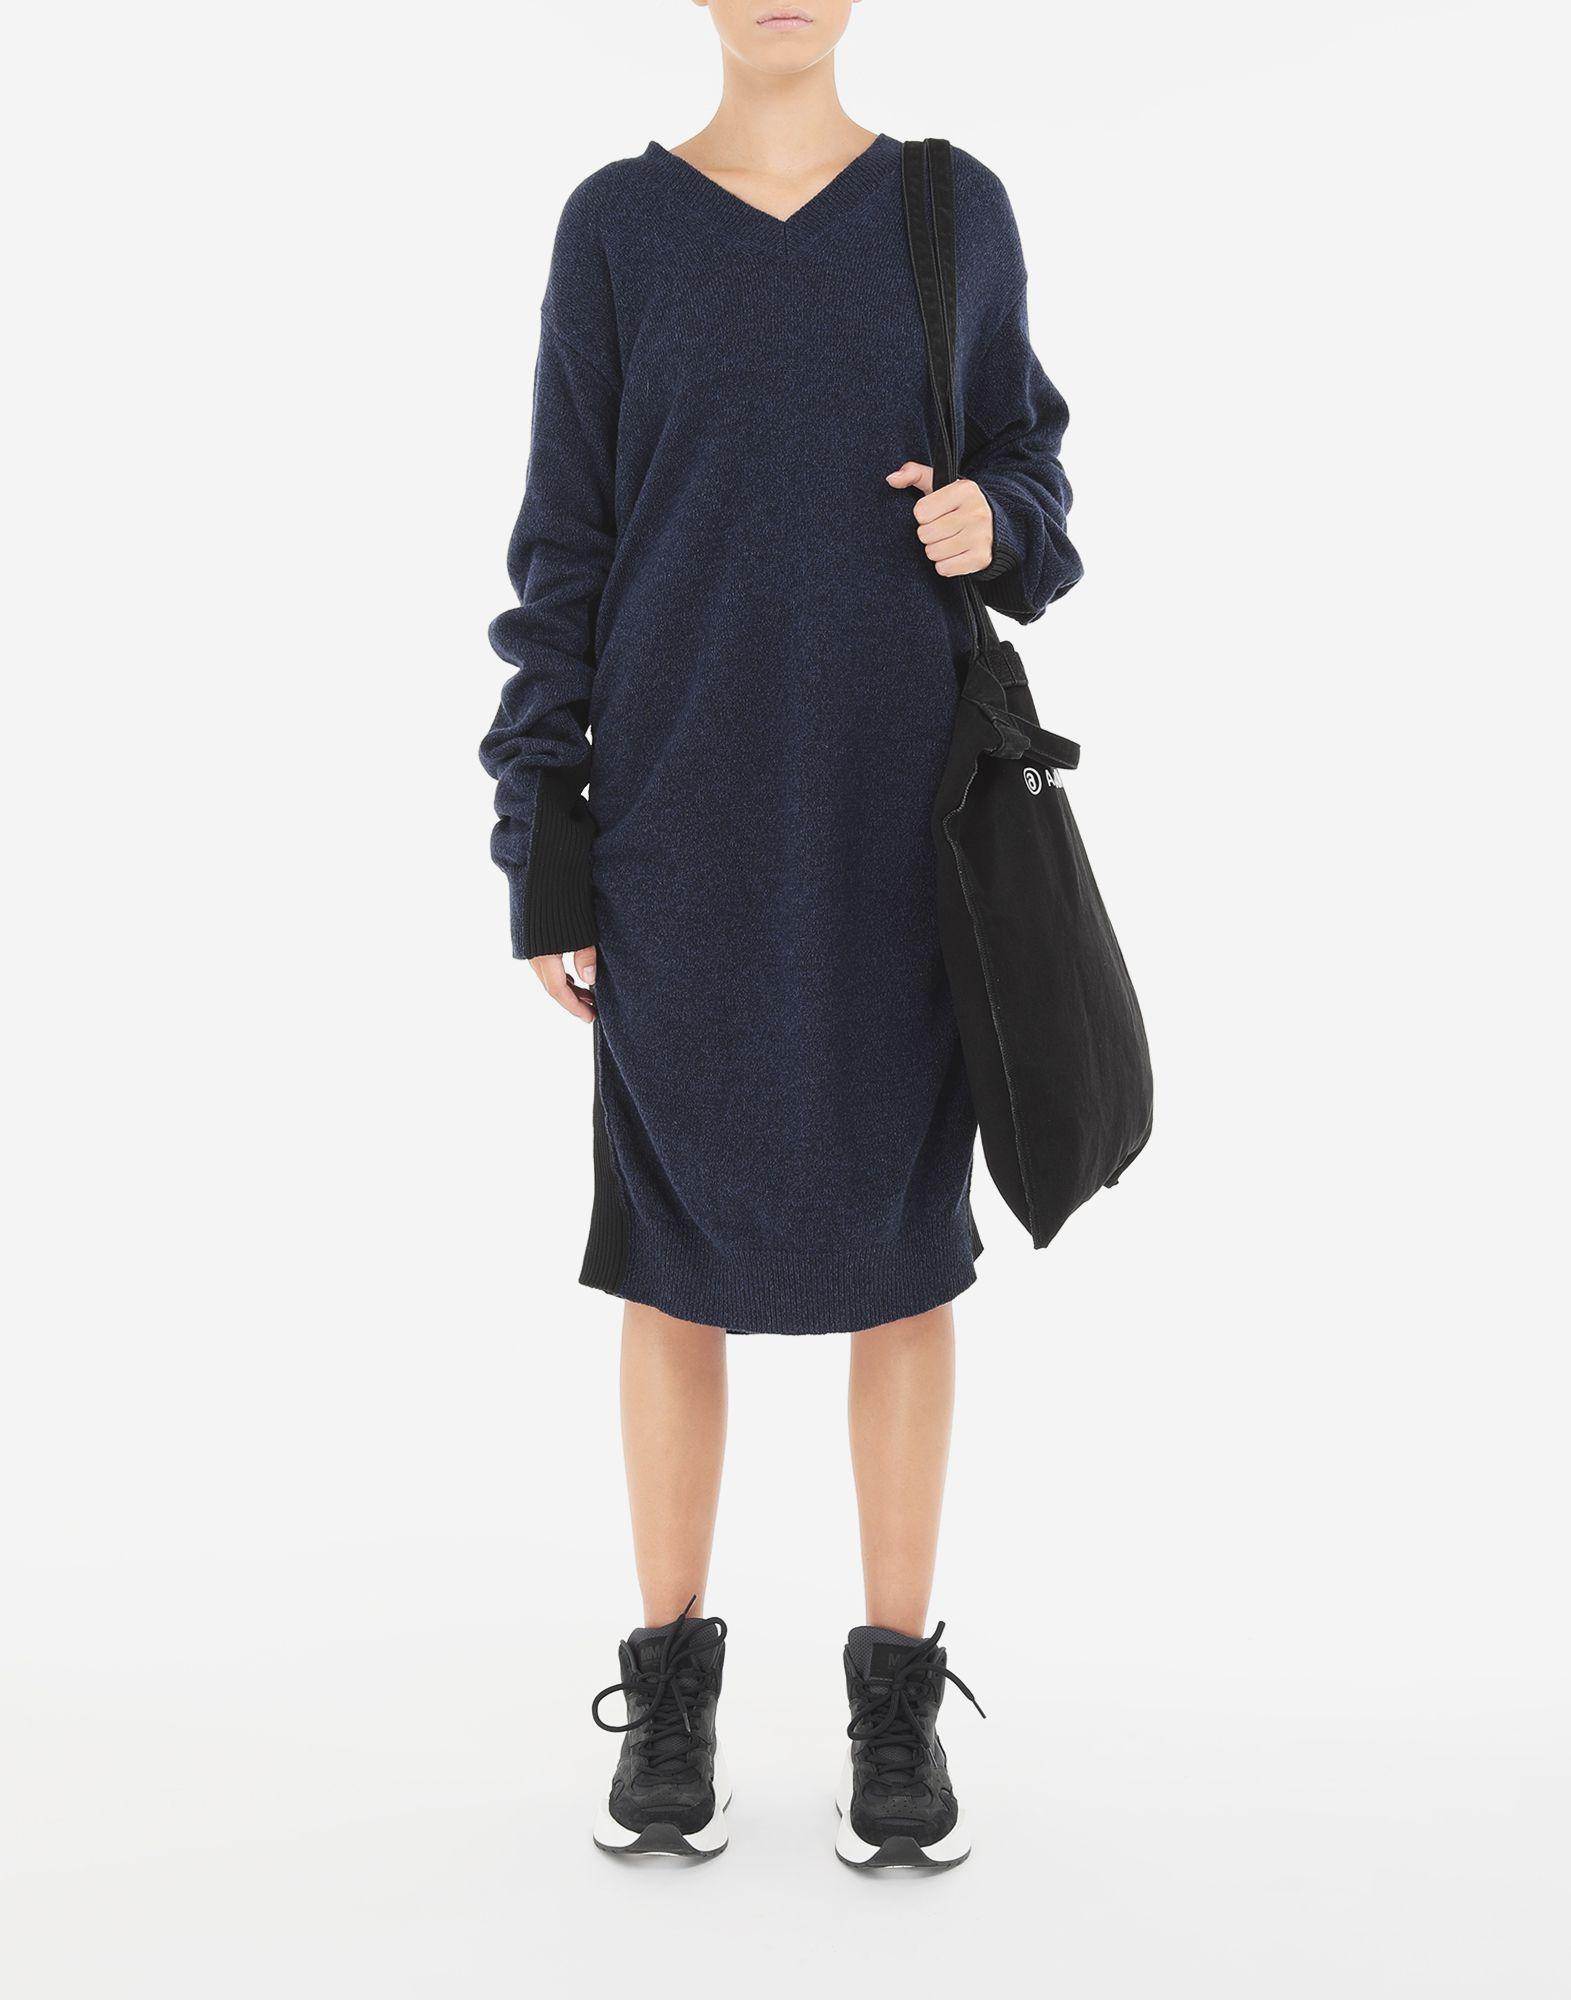 MM6 MAISON MARGIELA Ruched wool dress Dress Woman d